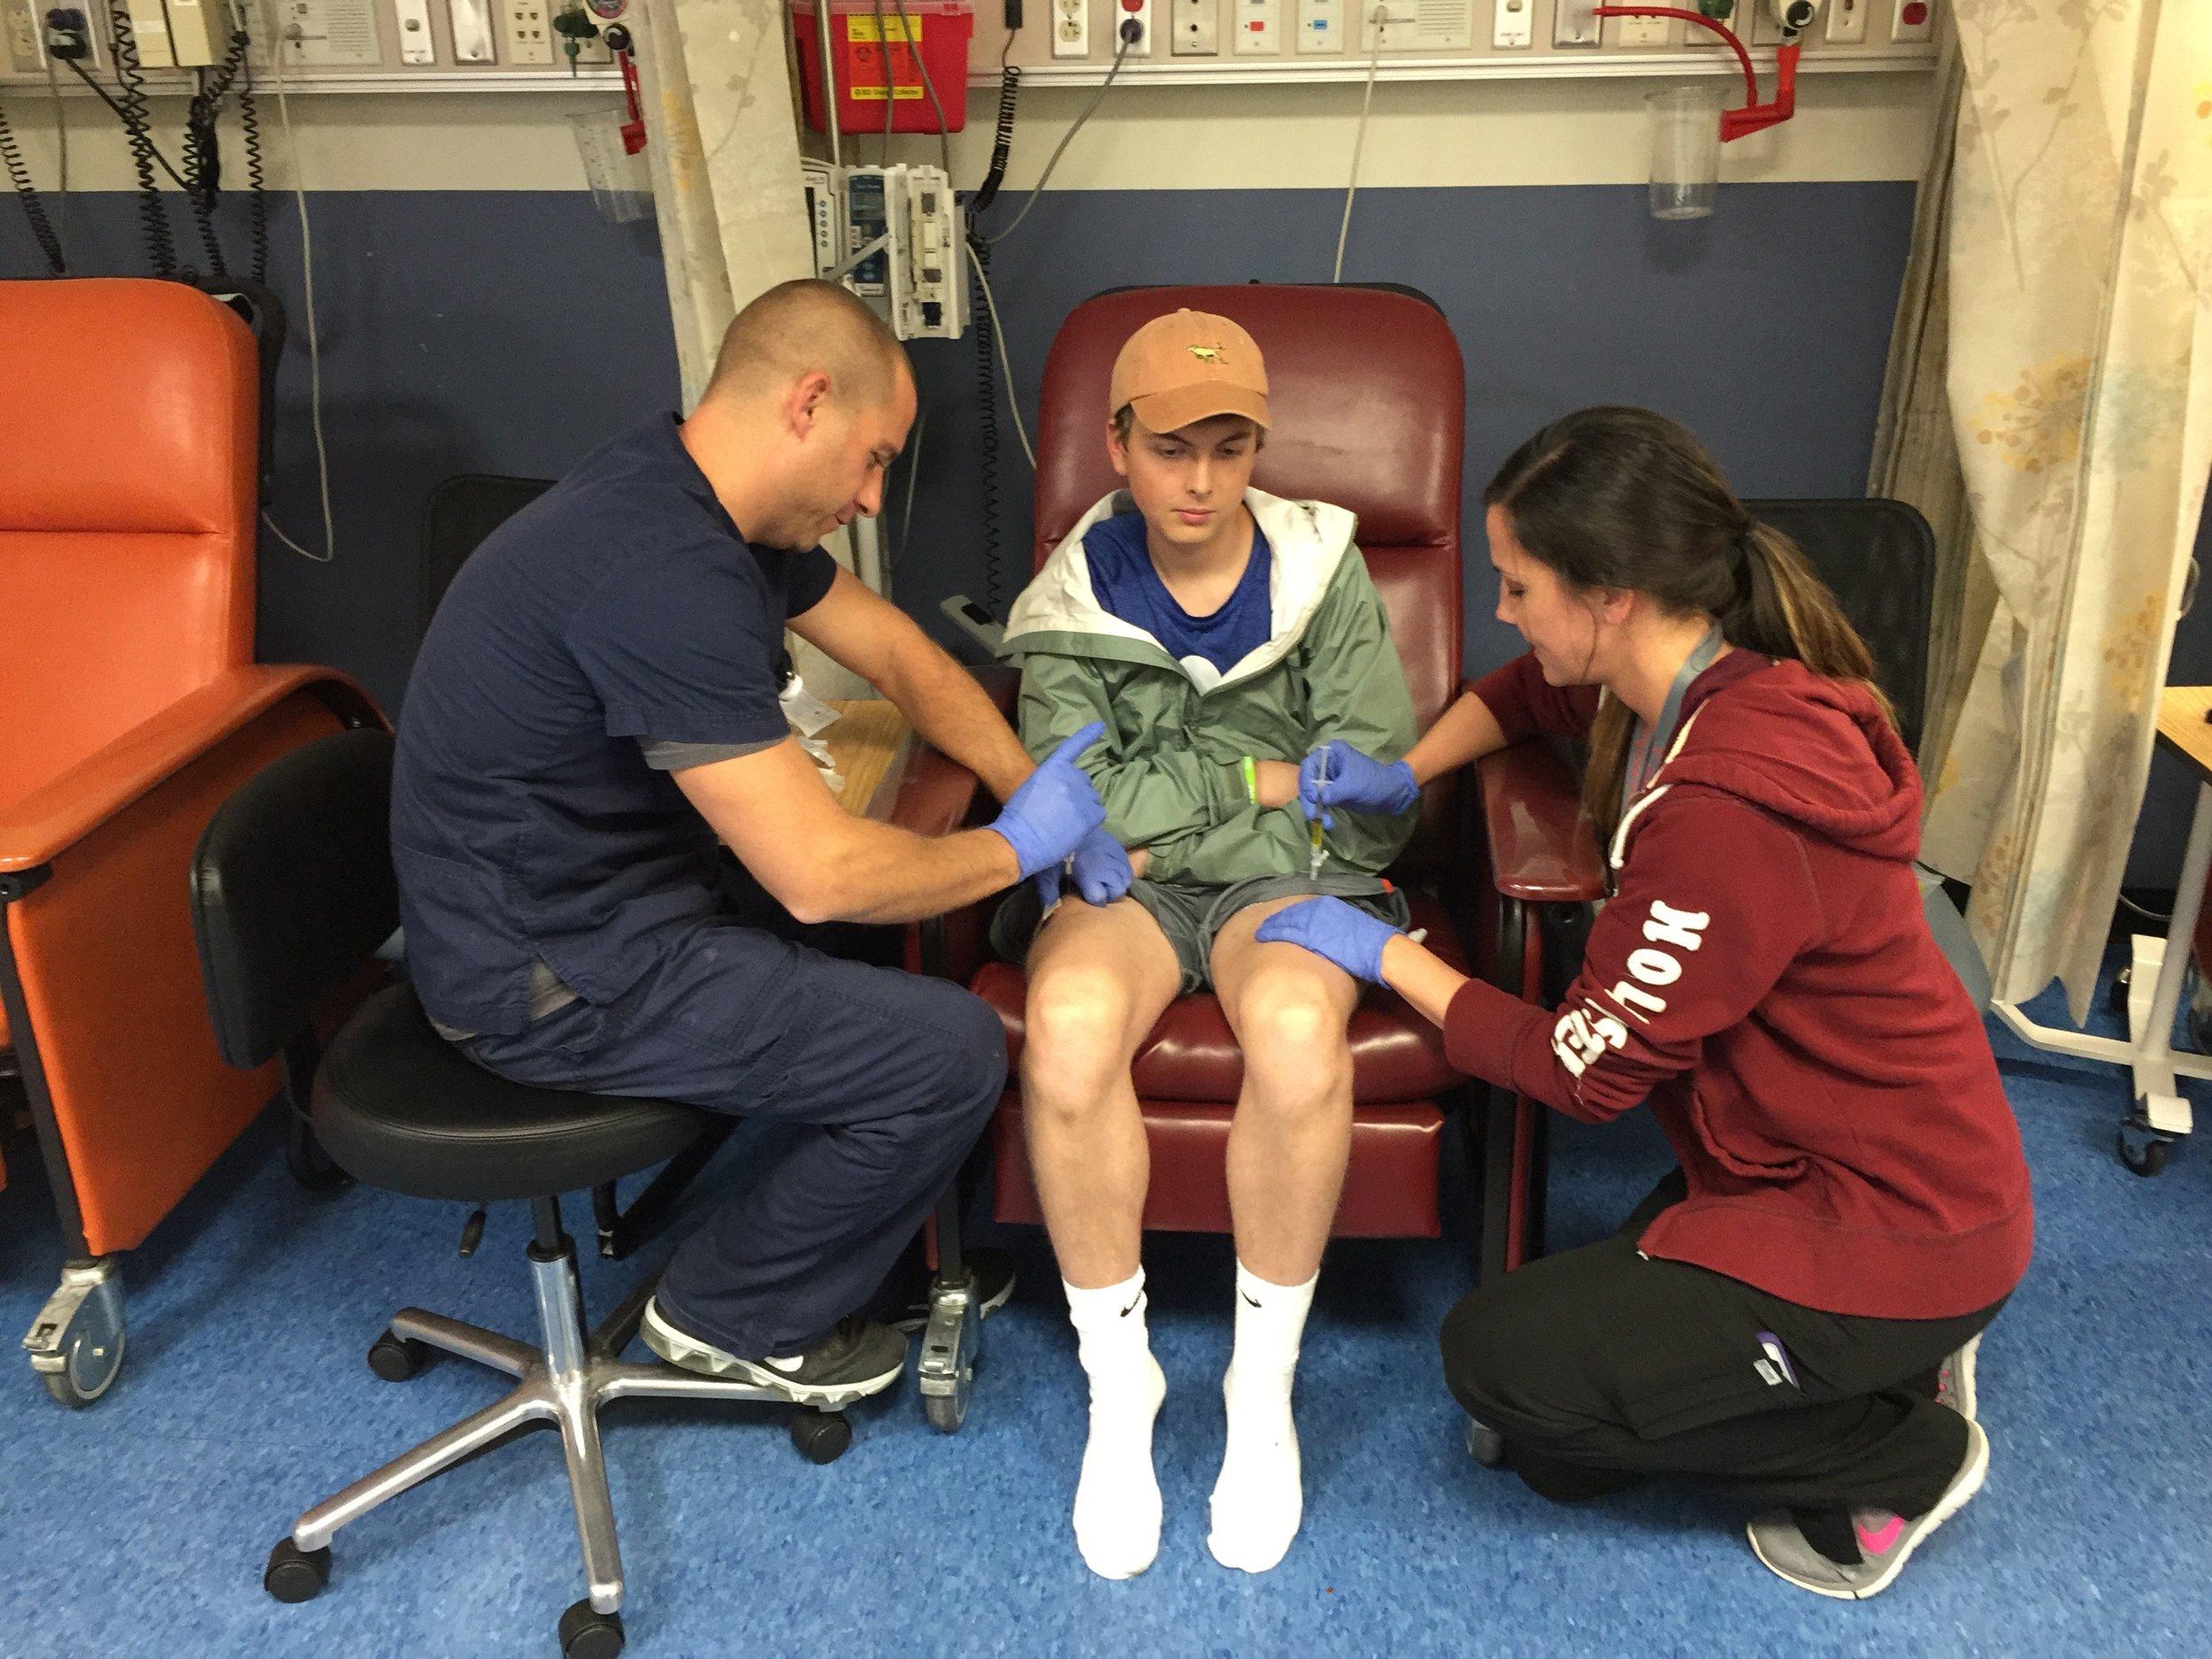 Adam receiving chemo in both legs days before running the St. Jude half marathon.